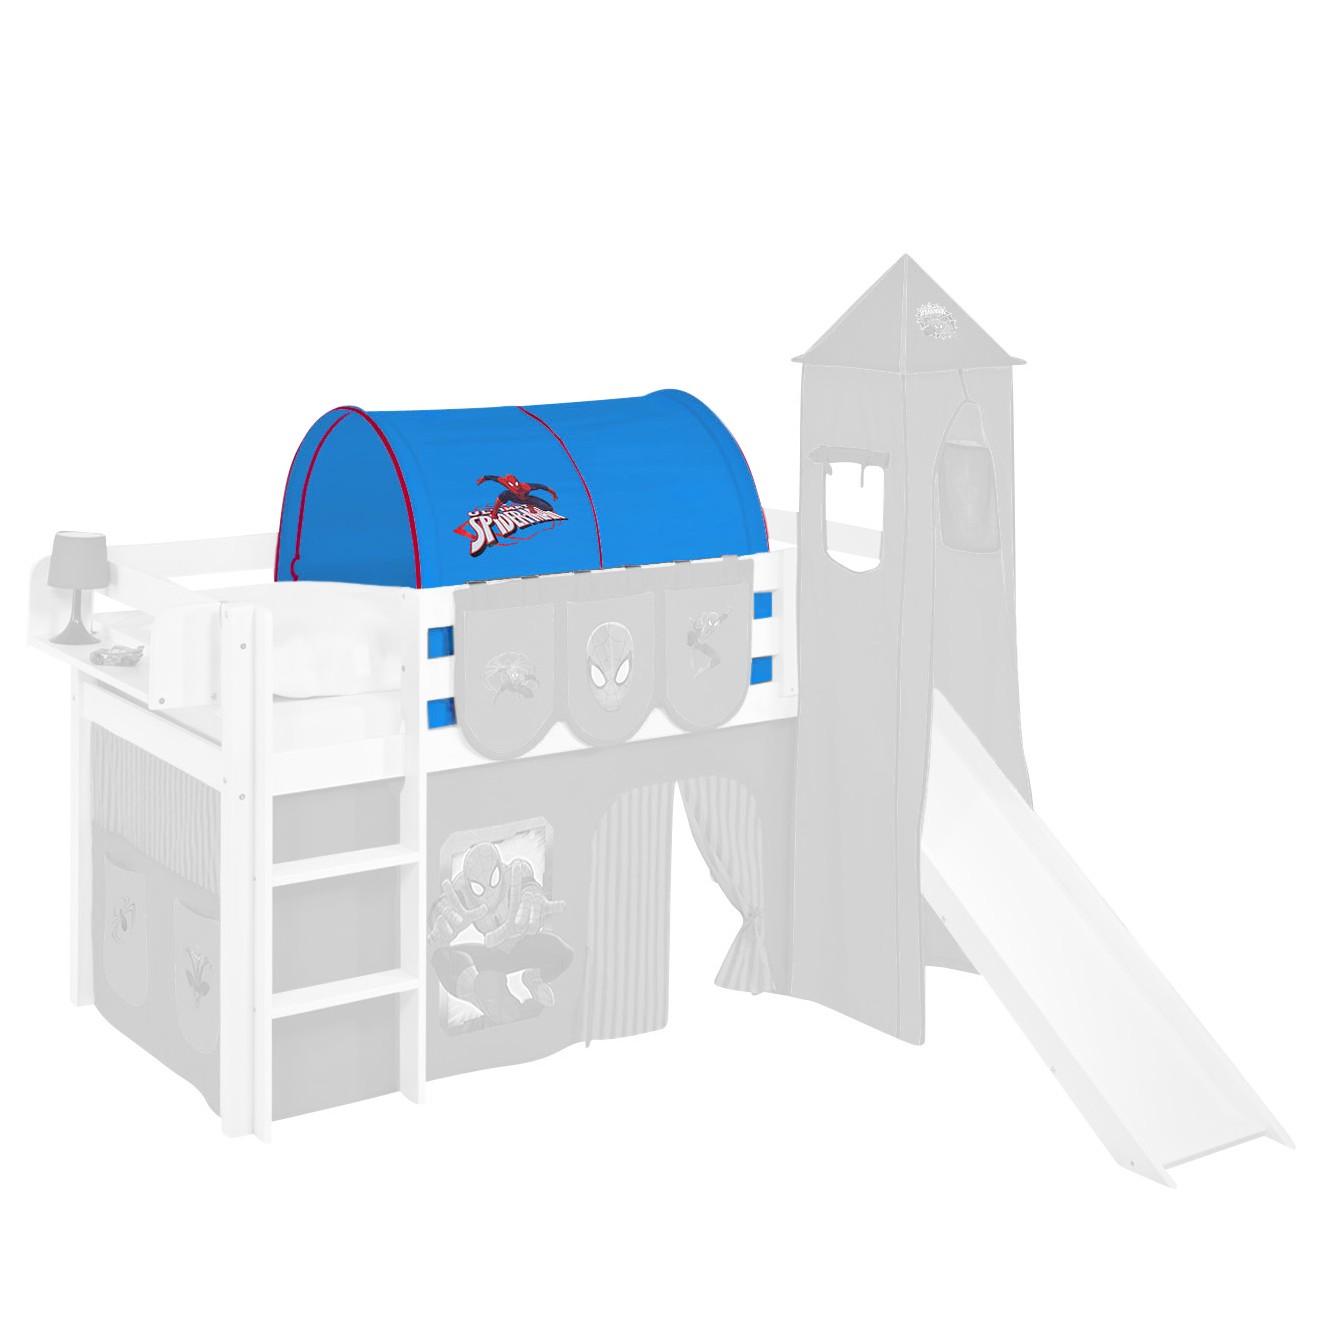 home24 Tunnel Spiderman | Kinderzimmer > Kinderbetten > Baldachine & Tunnels | Rot | Textil | Lilokids